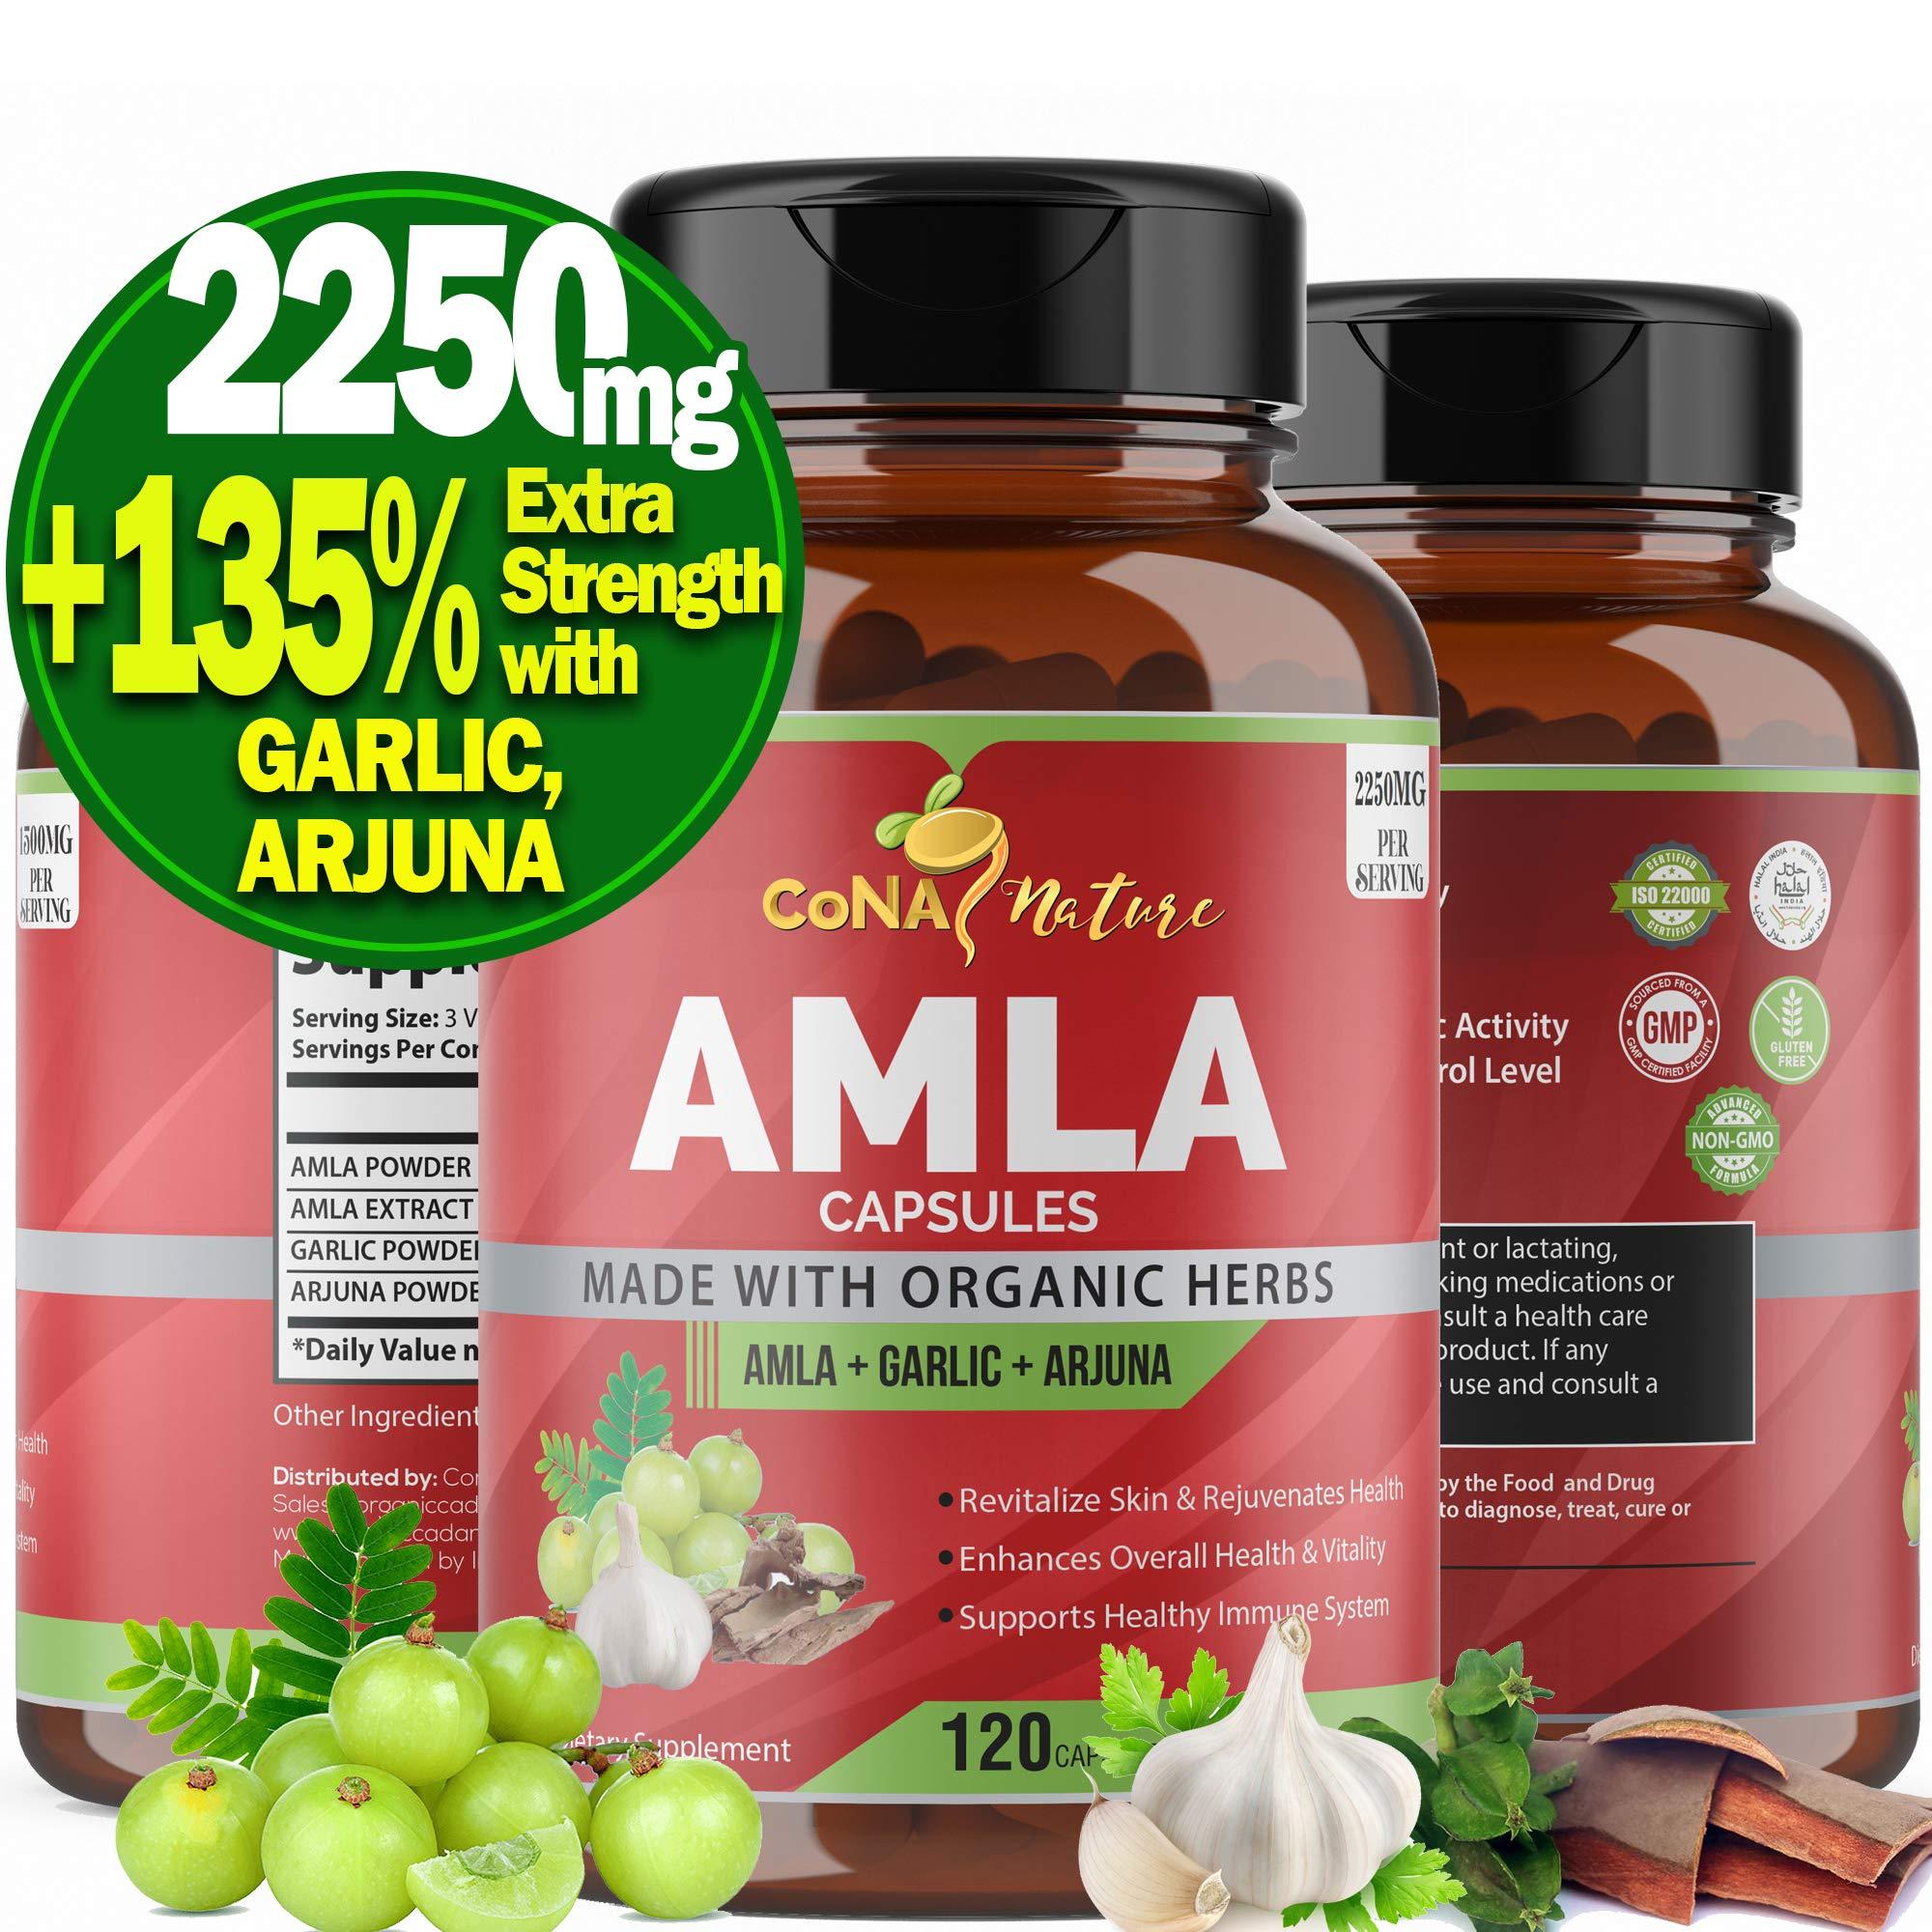 Organic Amla Capsules 2250mg & Arjuna, Garlic |Natural Vitamin C Supplements, High Antioxidants, Rejuvenator |Supports Immunity, Energy Booster |Gluten Free Vegan India Amalaki Extract Fruit, 120 Caps